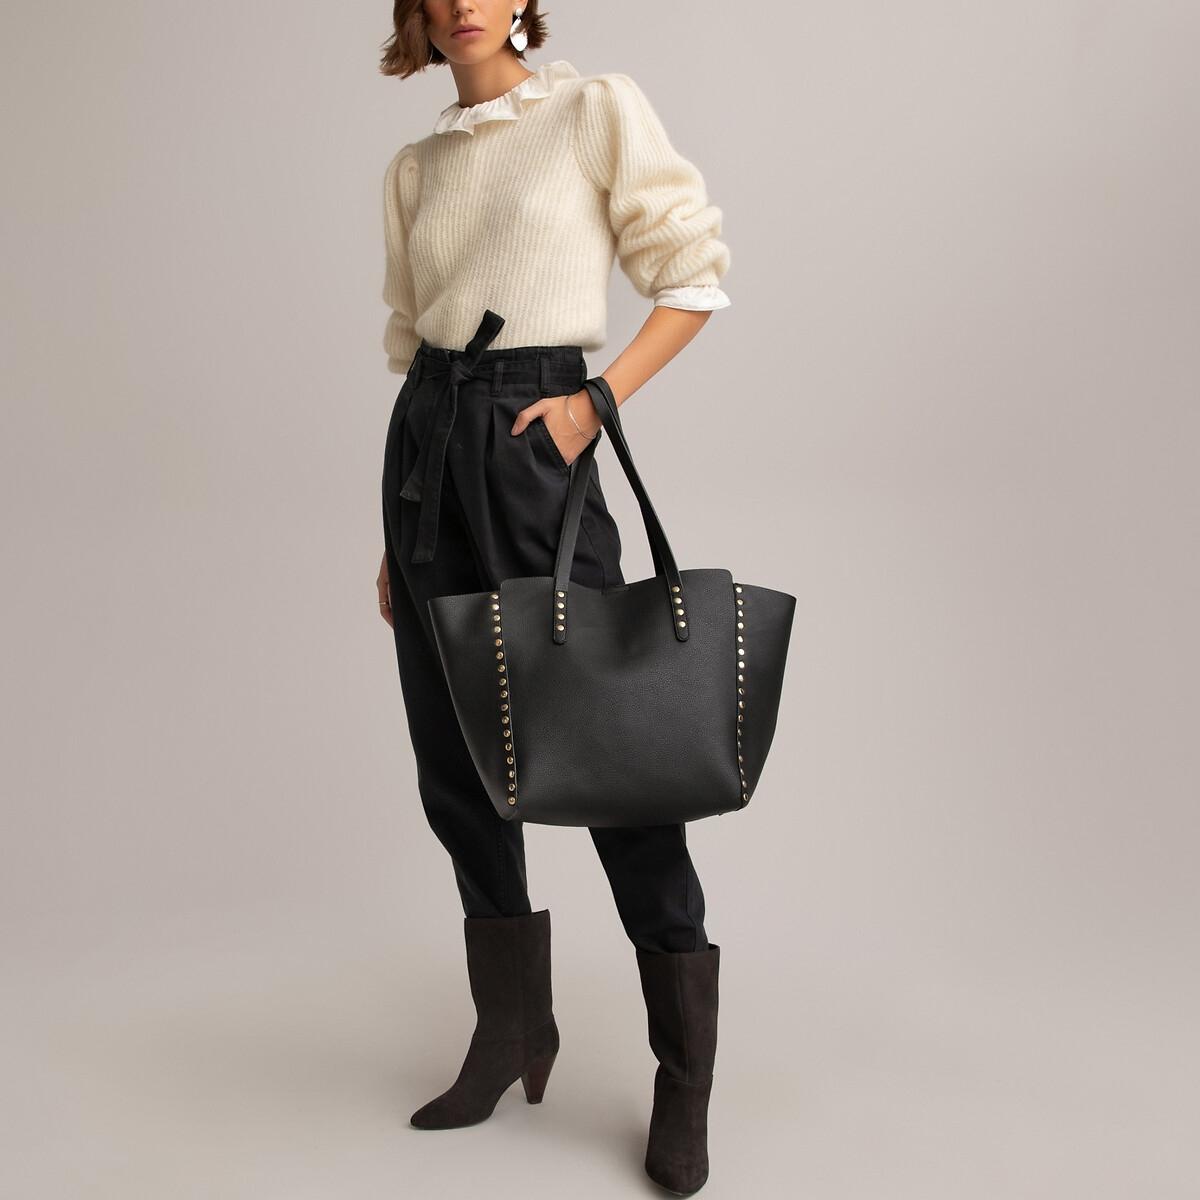 Сумка-шоппер LaRedoute La Redoute единый размер черный пуф la redoute из шерсти carito единый размер серый